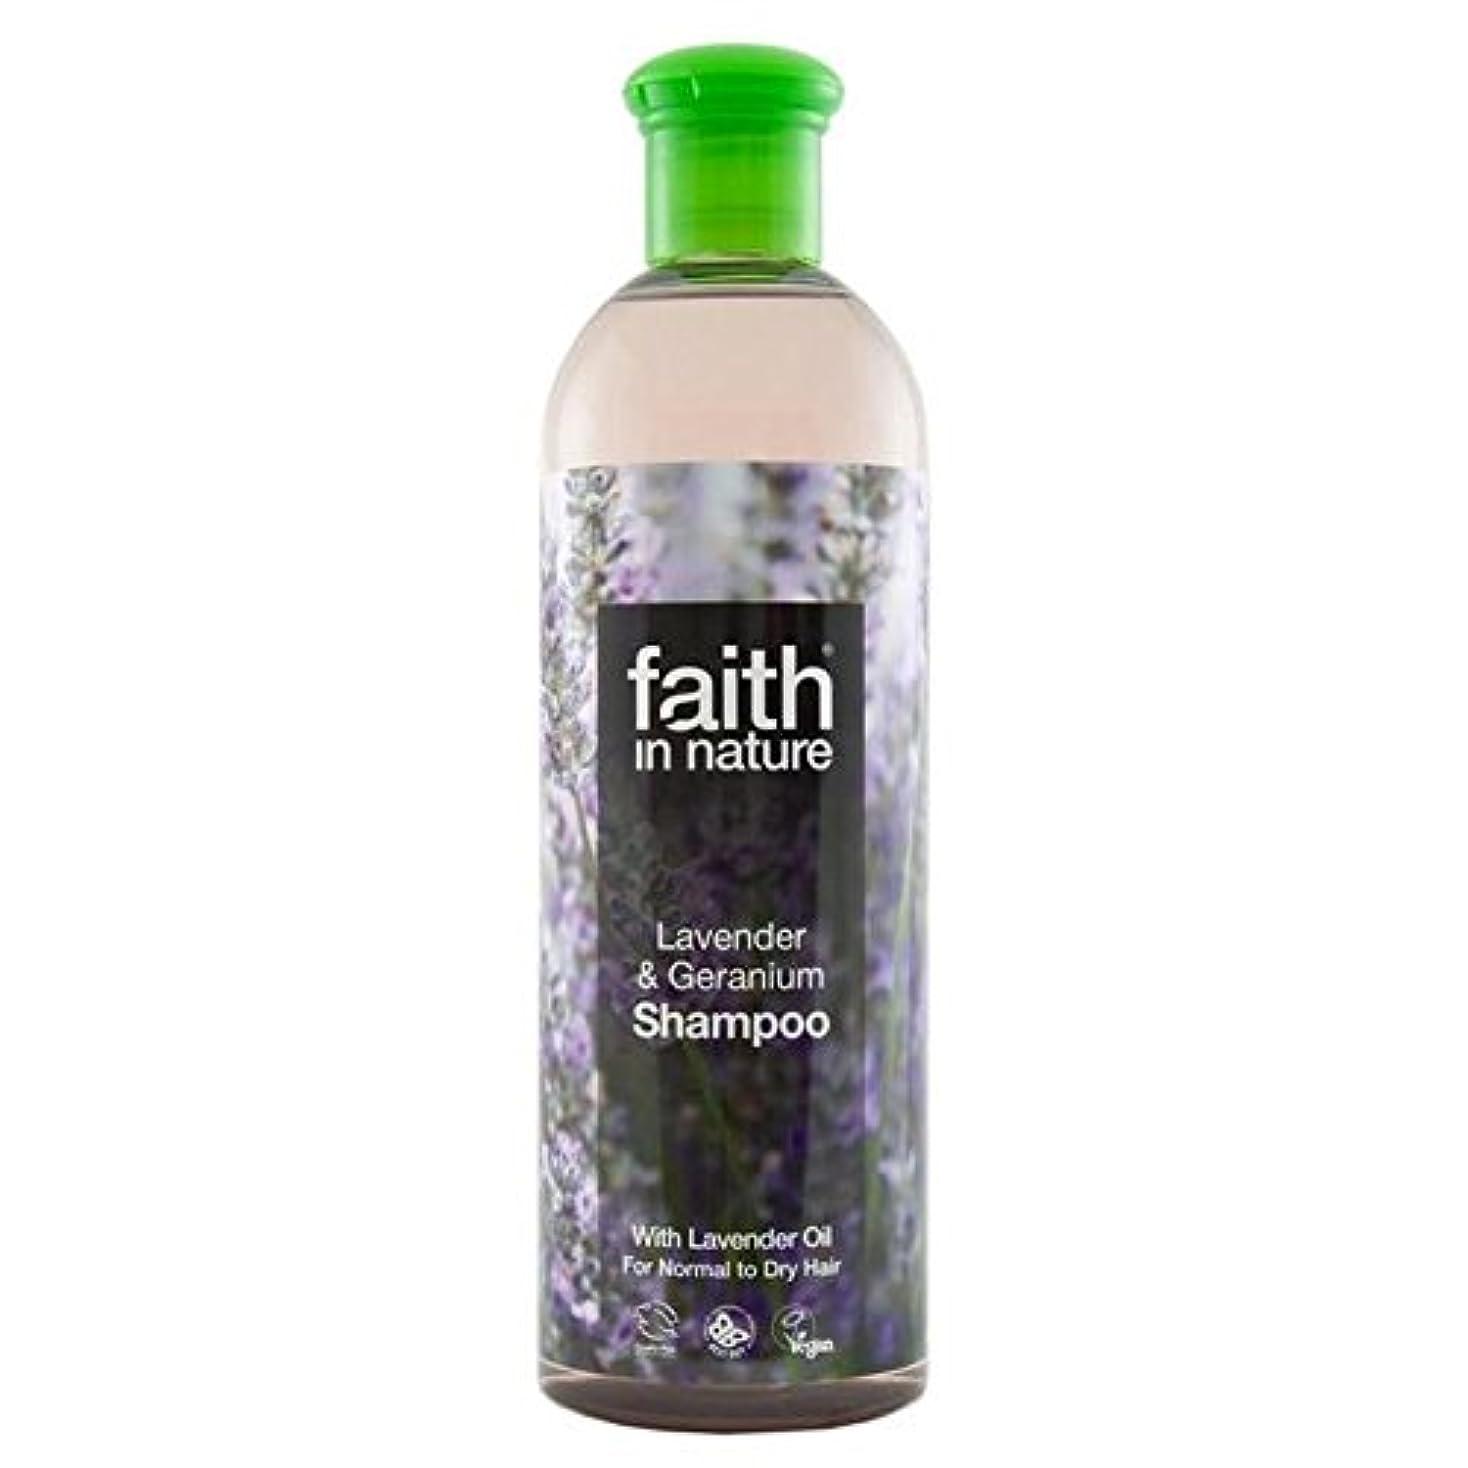 Faith in Nature Lavender & Geranium Shampoo 740ml (Pack of 6) - (Faith In Nature) 自然ラベンダー&ゼラニウムのシャンプー740ミリリットルの信仰 (x6) [並行輸入品]